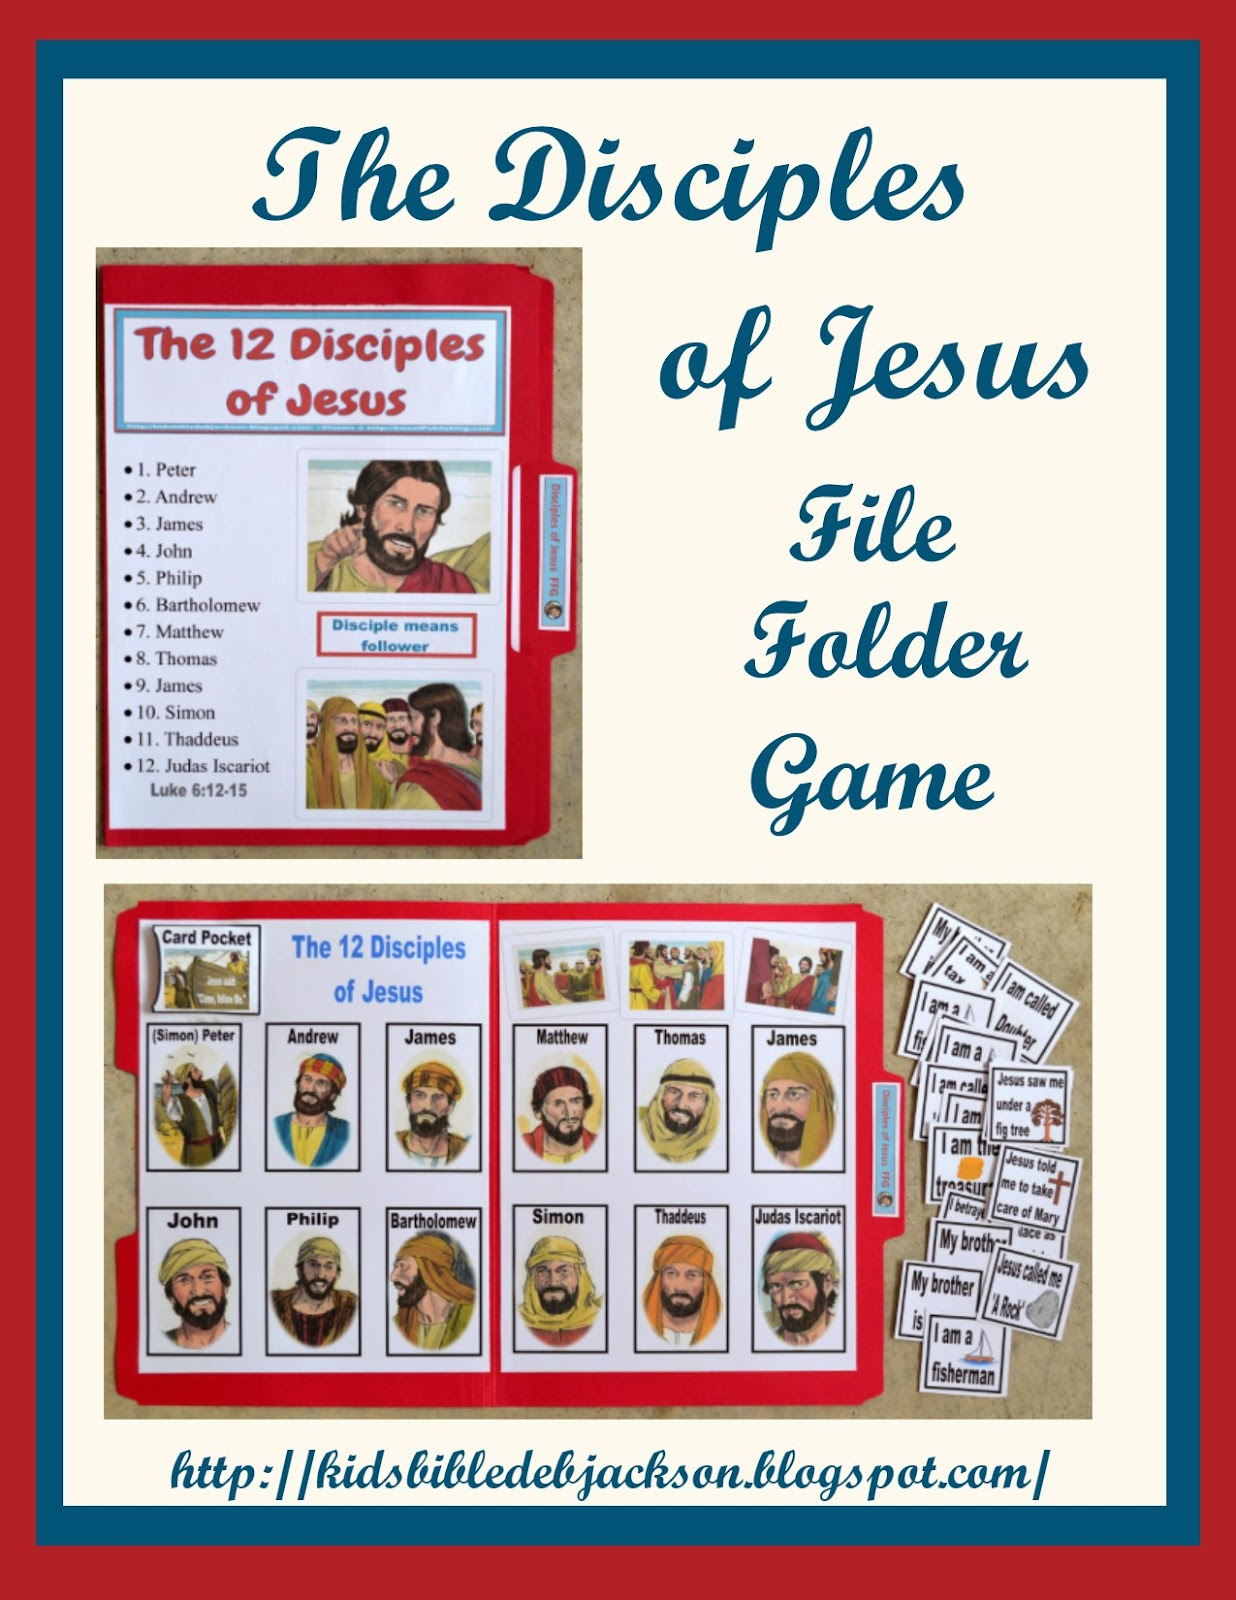 http://kidsbibledebjackson.blogspot.com/2014/03/disciples-vs-apostles-posters-file.html